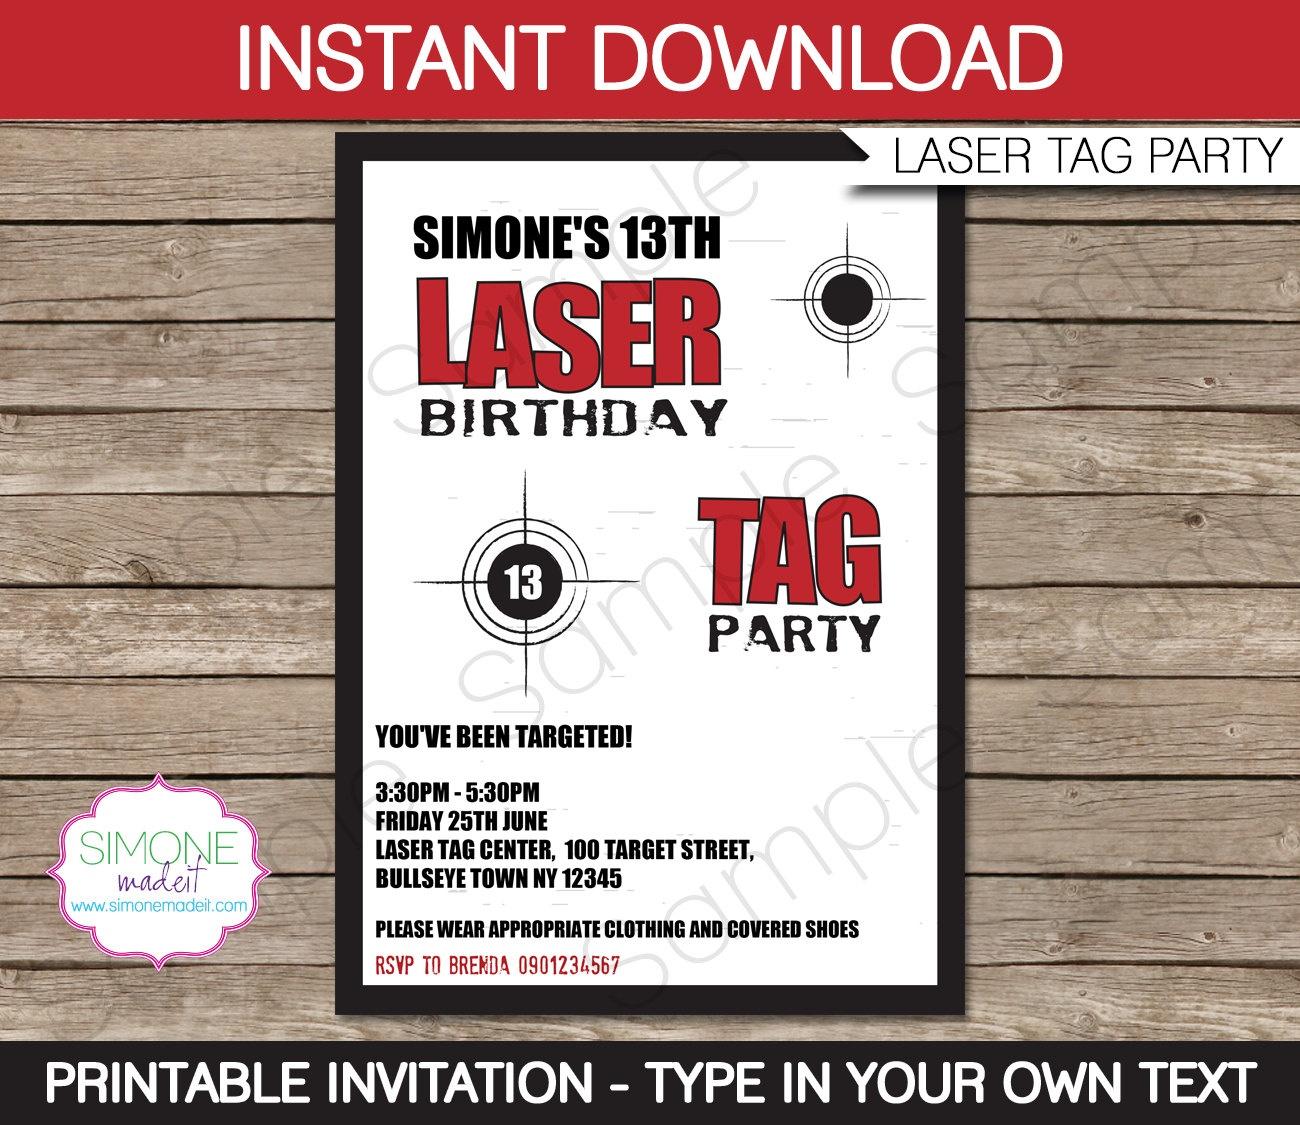 Laser Tag Birthday Invitations Free Printable – Happy Holidays! - Free Printable Laser Tag Invitation Template